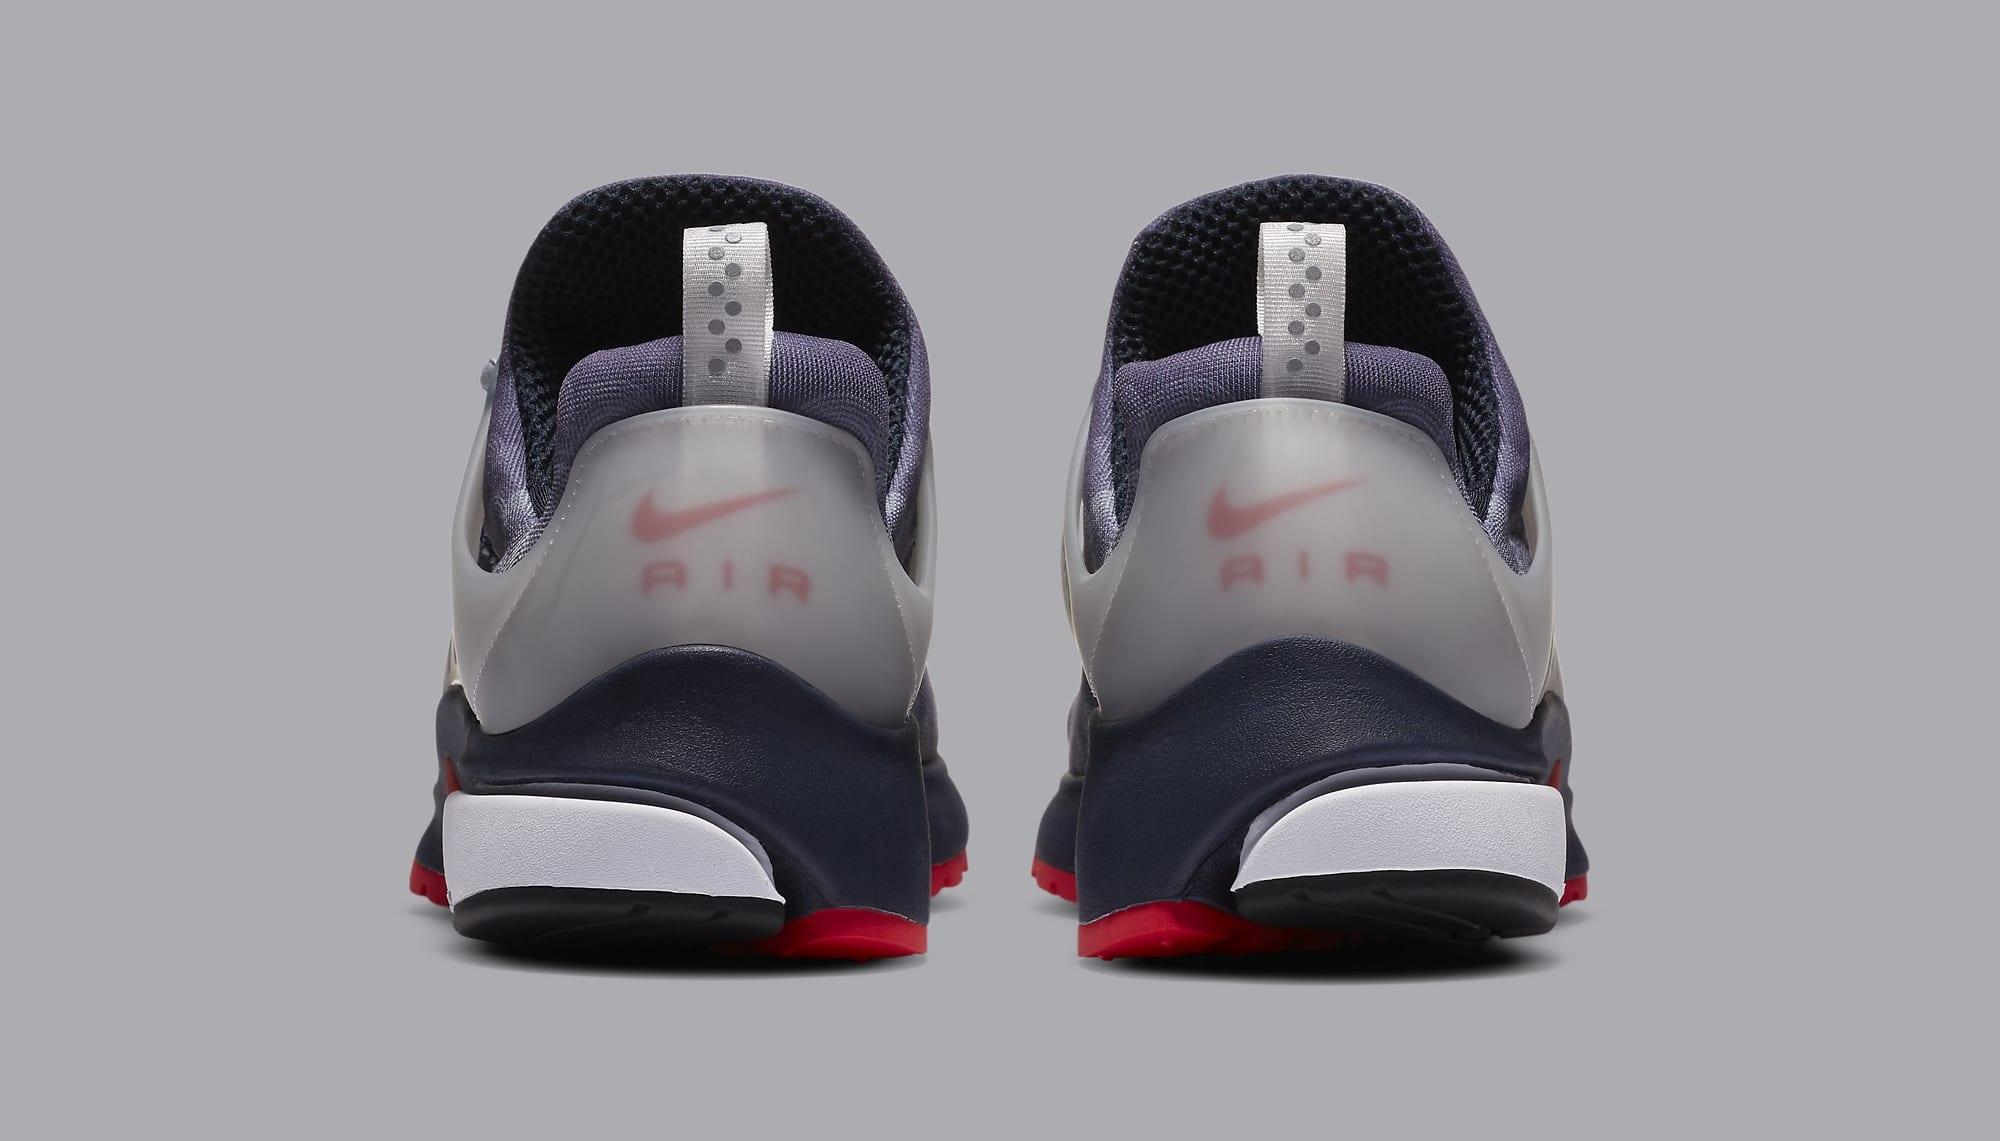 Nike Air Presto 'Navy' CJ1229-400 Heel